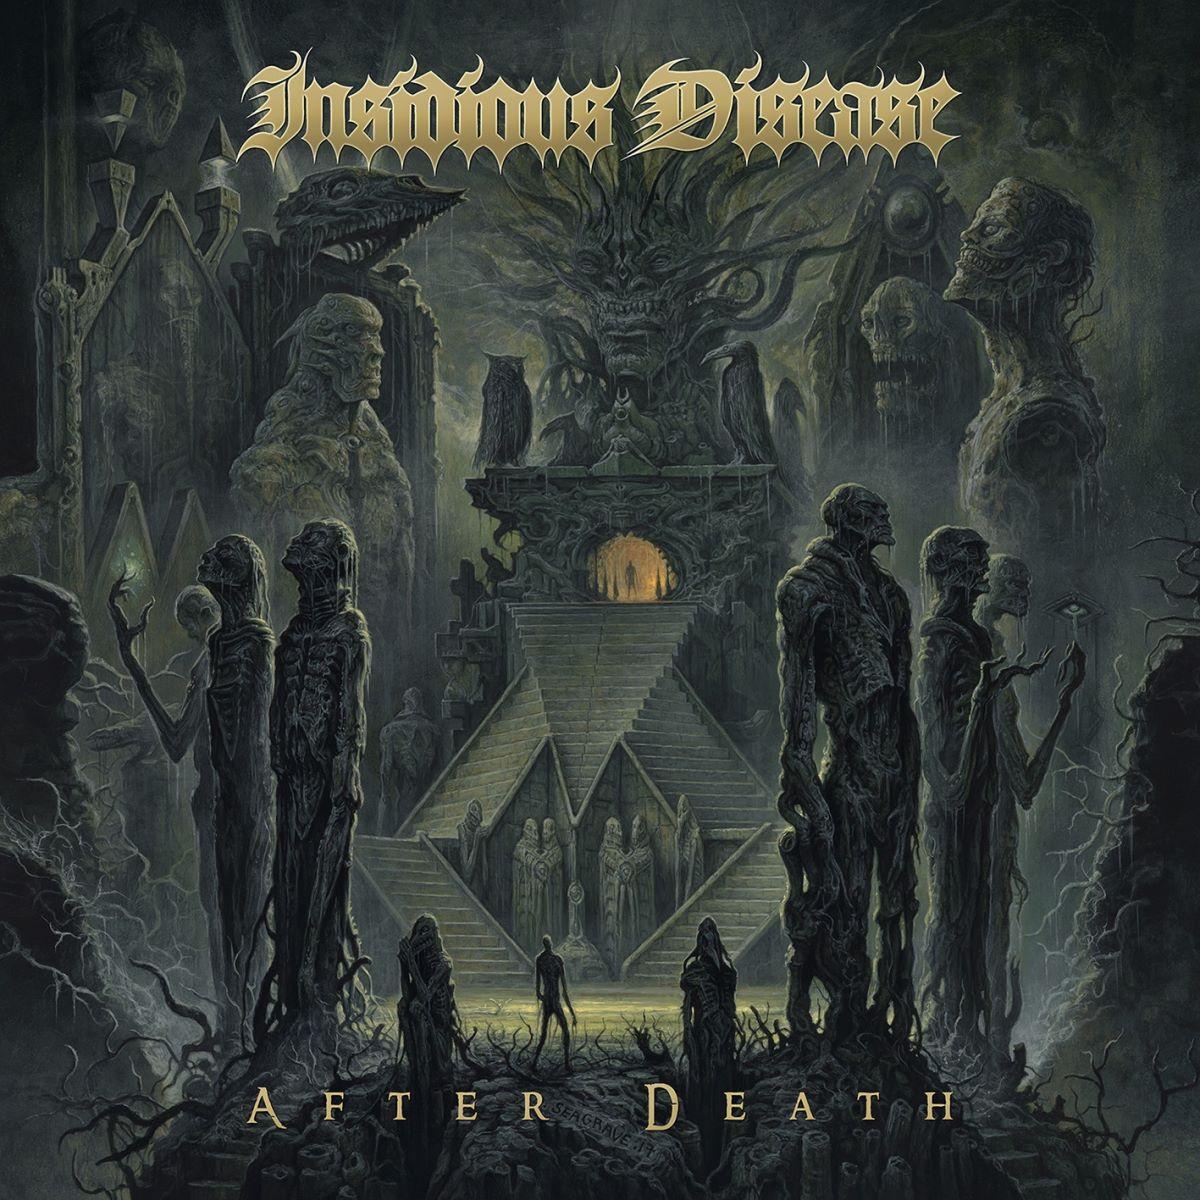 Insidious Disease - After Death - album cover